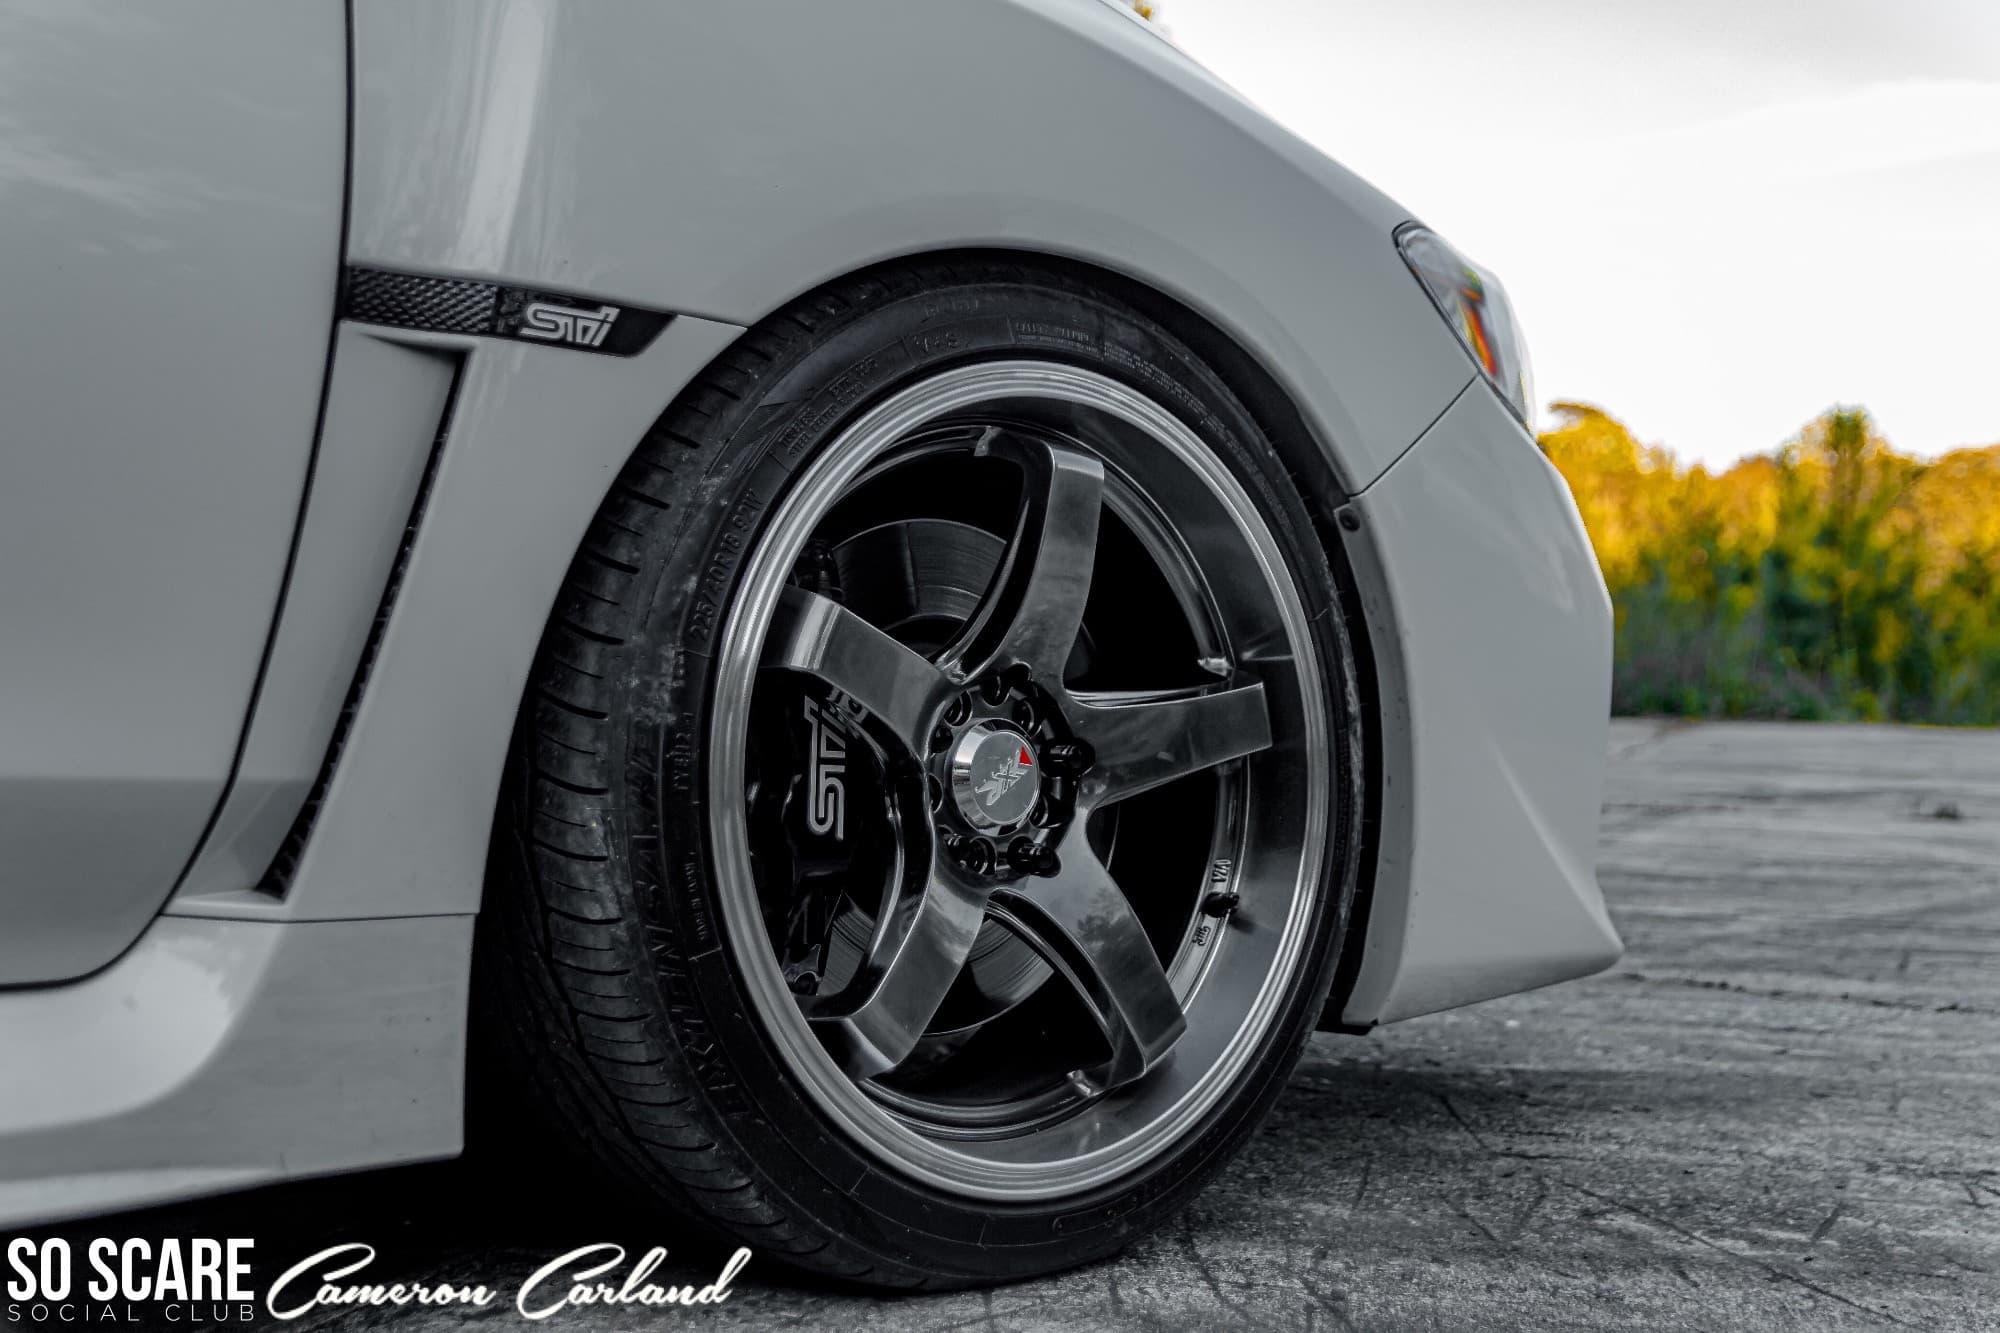 Tire shot of a 2017 SUBARU WRX STI BASE XXR 555 18x8.5 +35 Toyo Tires Extensa Hp Ii 225/40